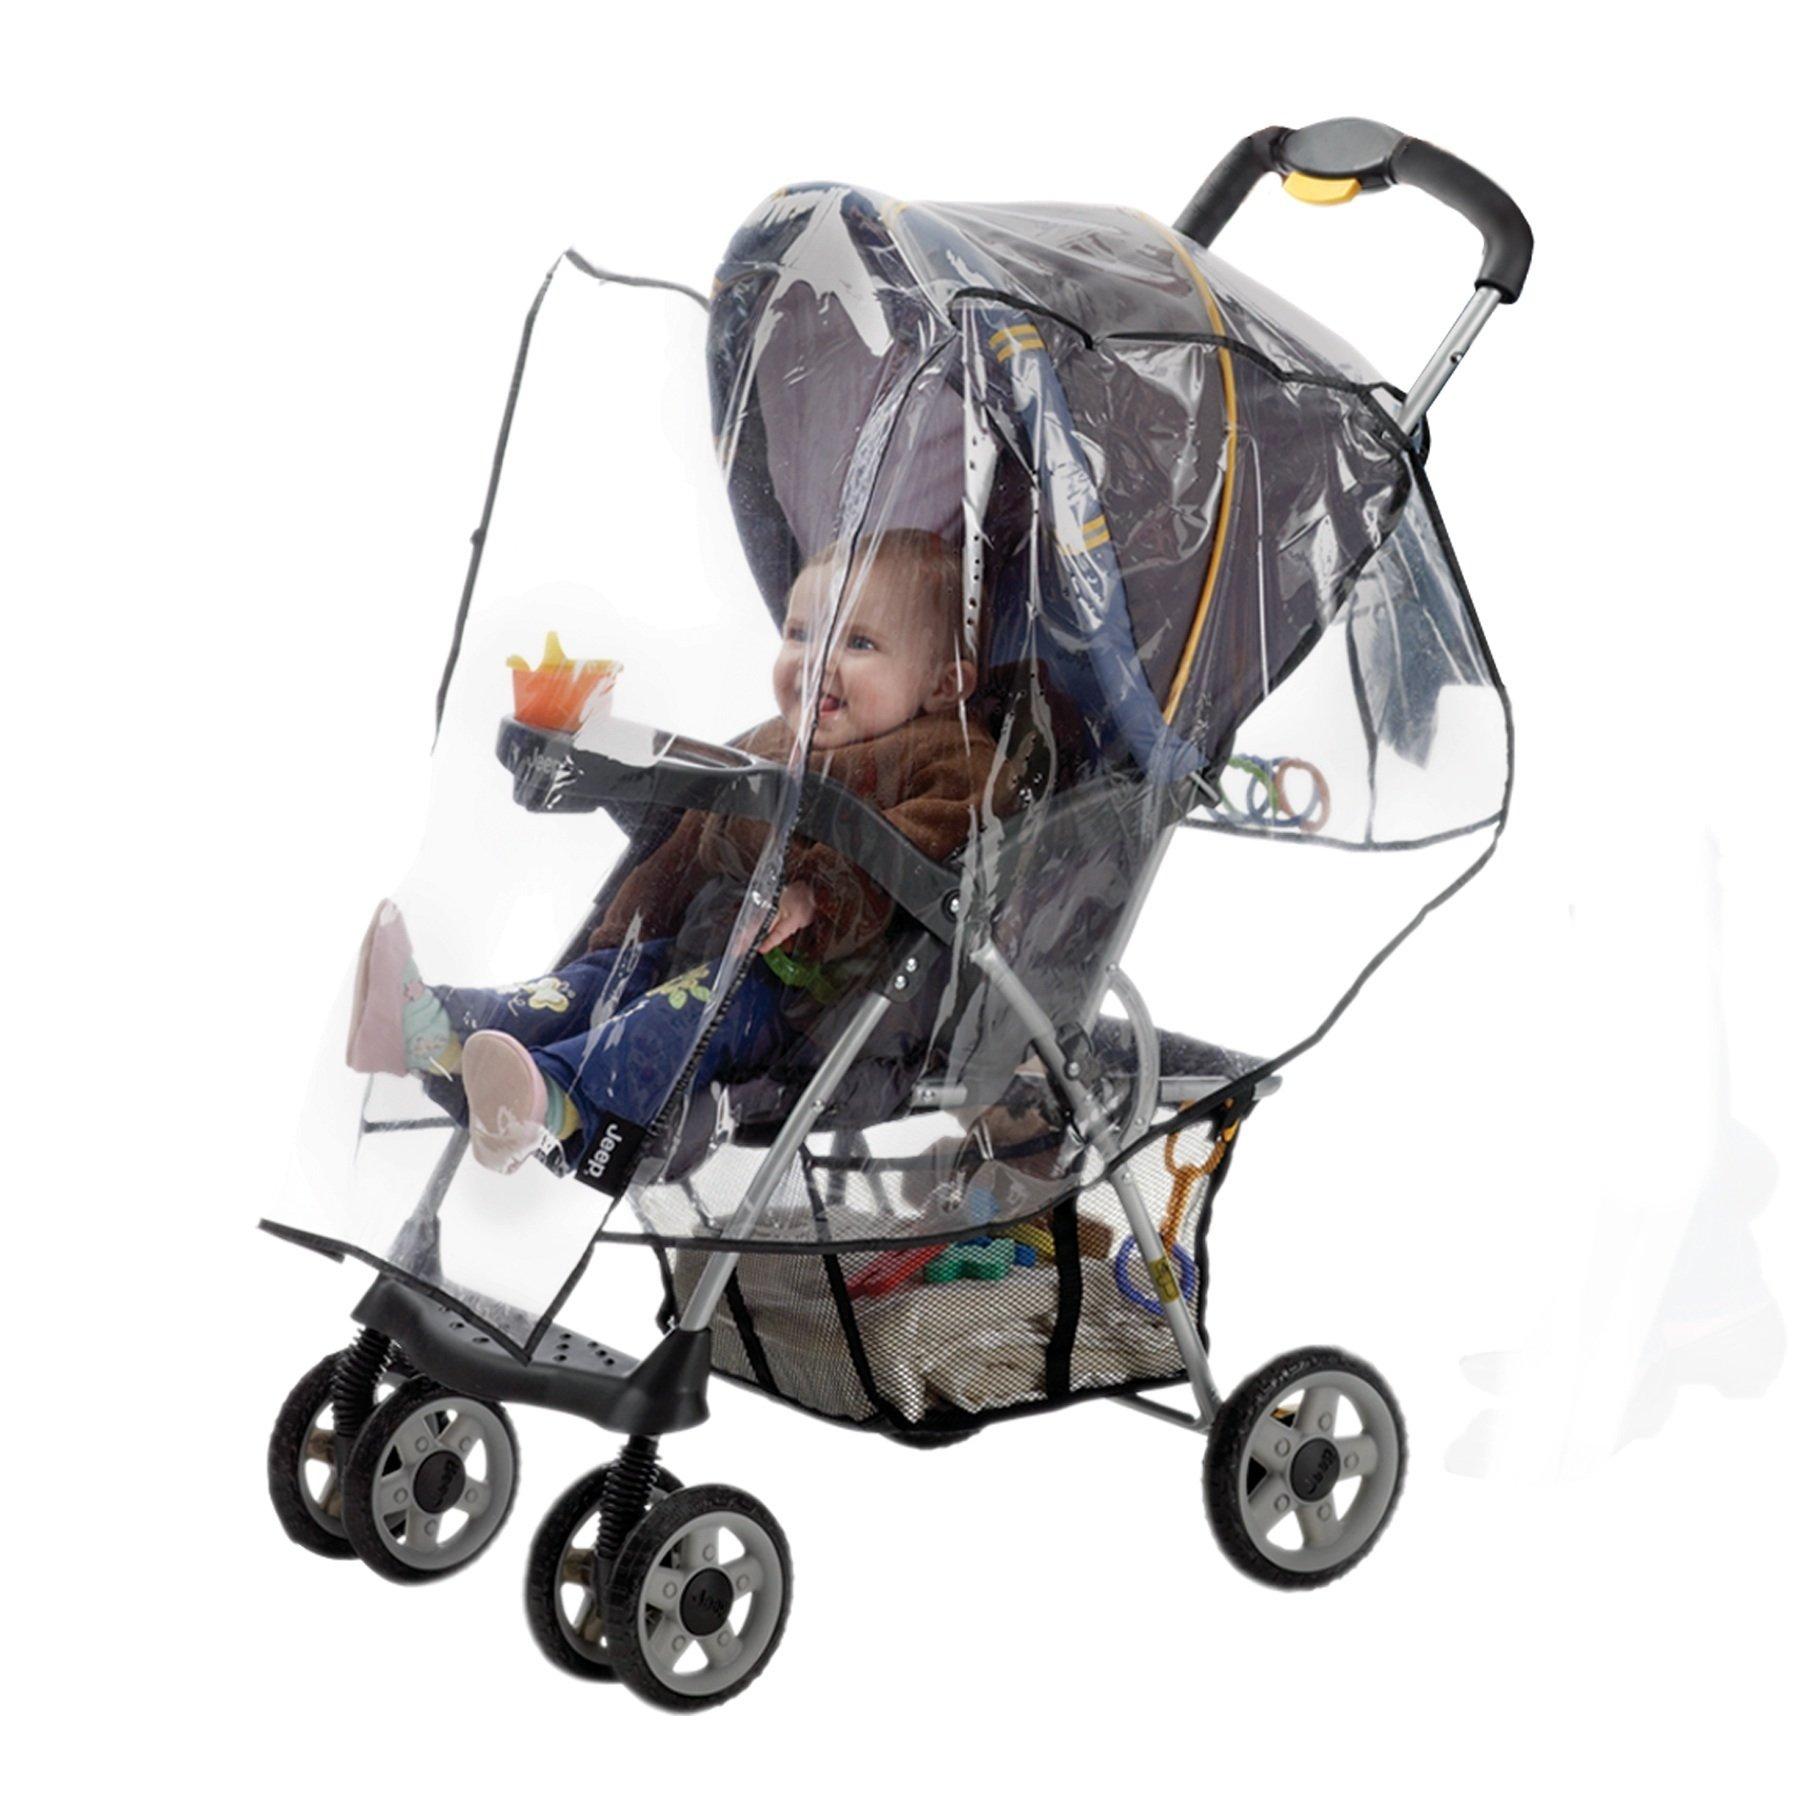 Jeep Standard Stroller Rain Cover, Stroller Rain Cover, Baby Rain Cover, Stroller Accessories, Stroller Weather Shield, Universal Size, Waterproof, Windproof, Ventilation, Clear Vinyl Plastic